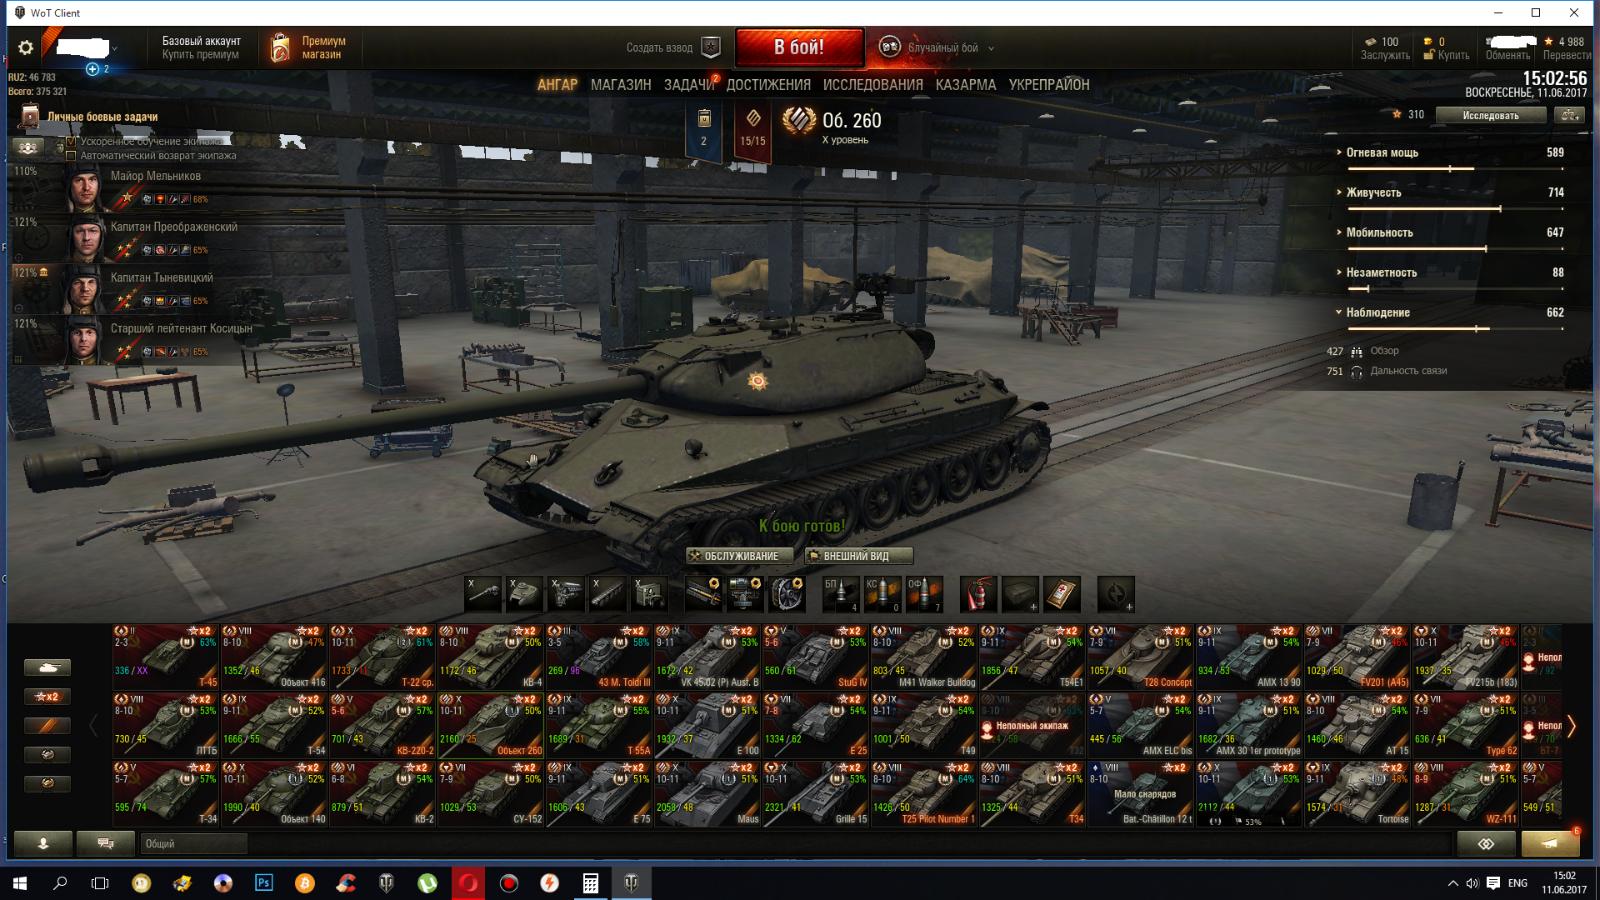 World Of Tanks Wot Ru Account Obj 260 Wn8 1520 53 Wins World Of Tanks World Hockey Rink